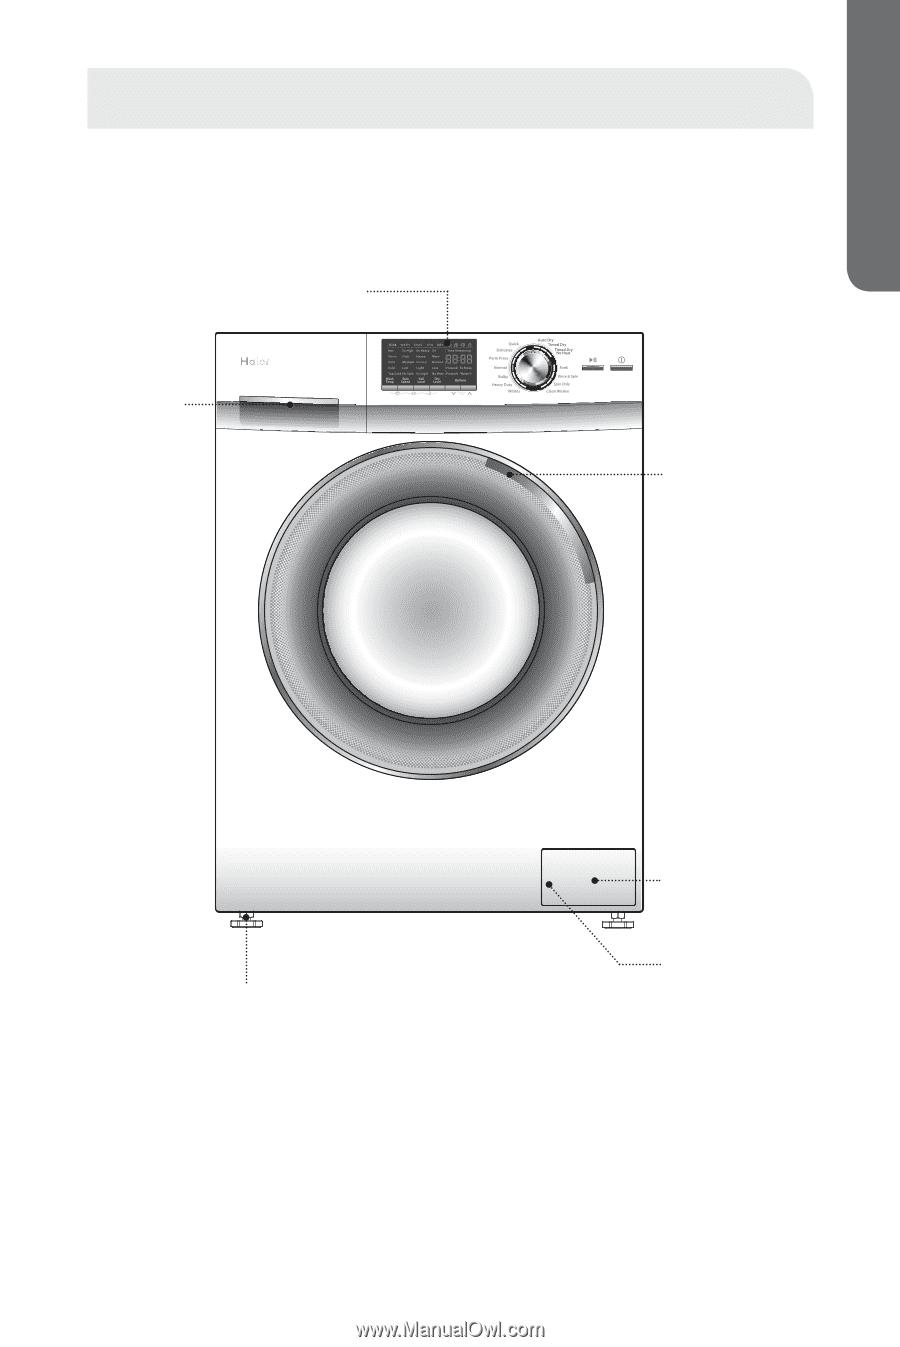 Fagor innovation Washing Machine manual